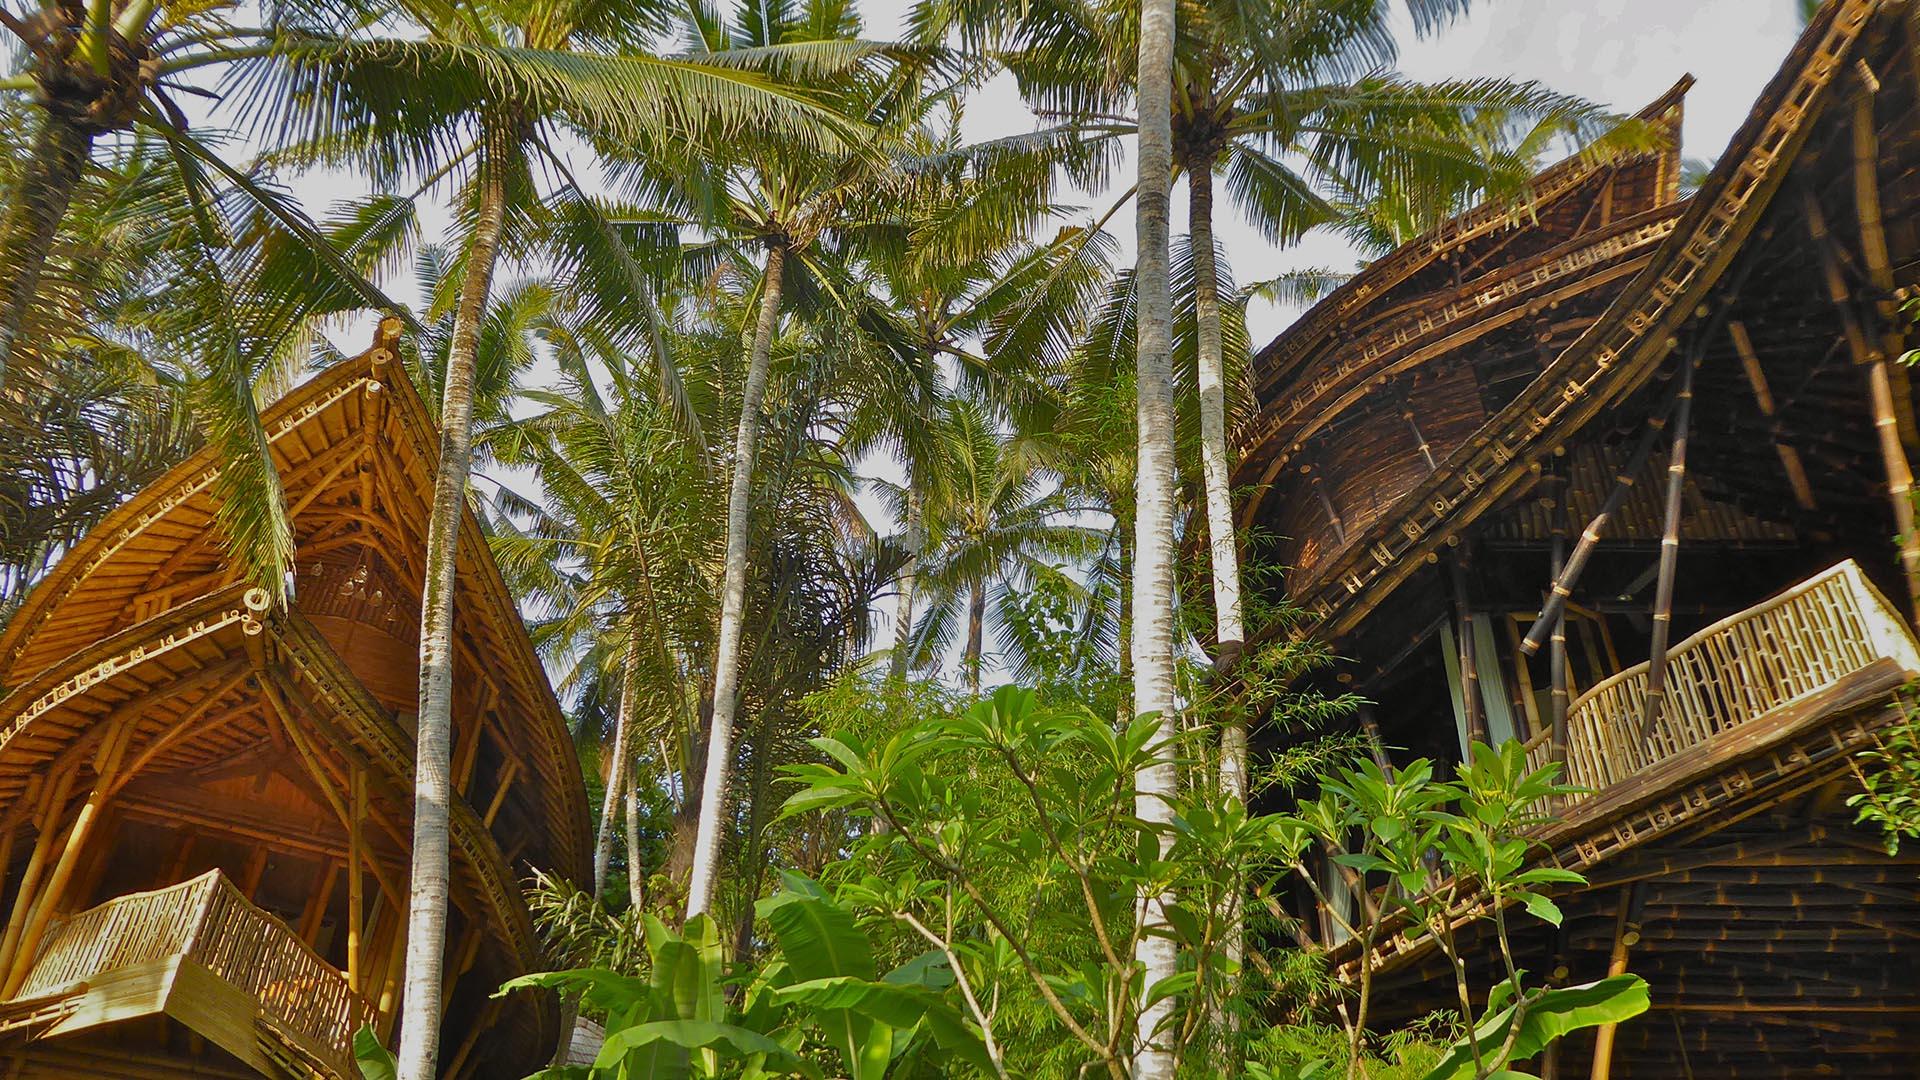 Ananda House An Exotic Bamboo Paradise In Abiansemal Bali